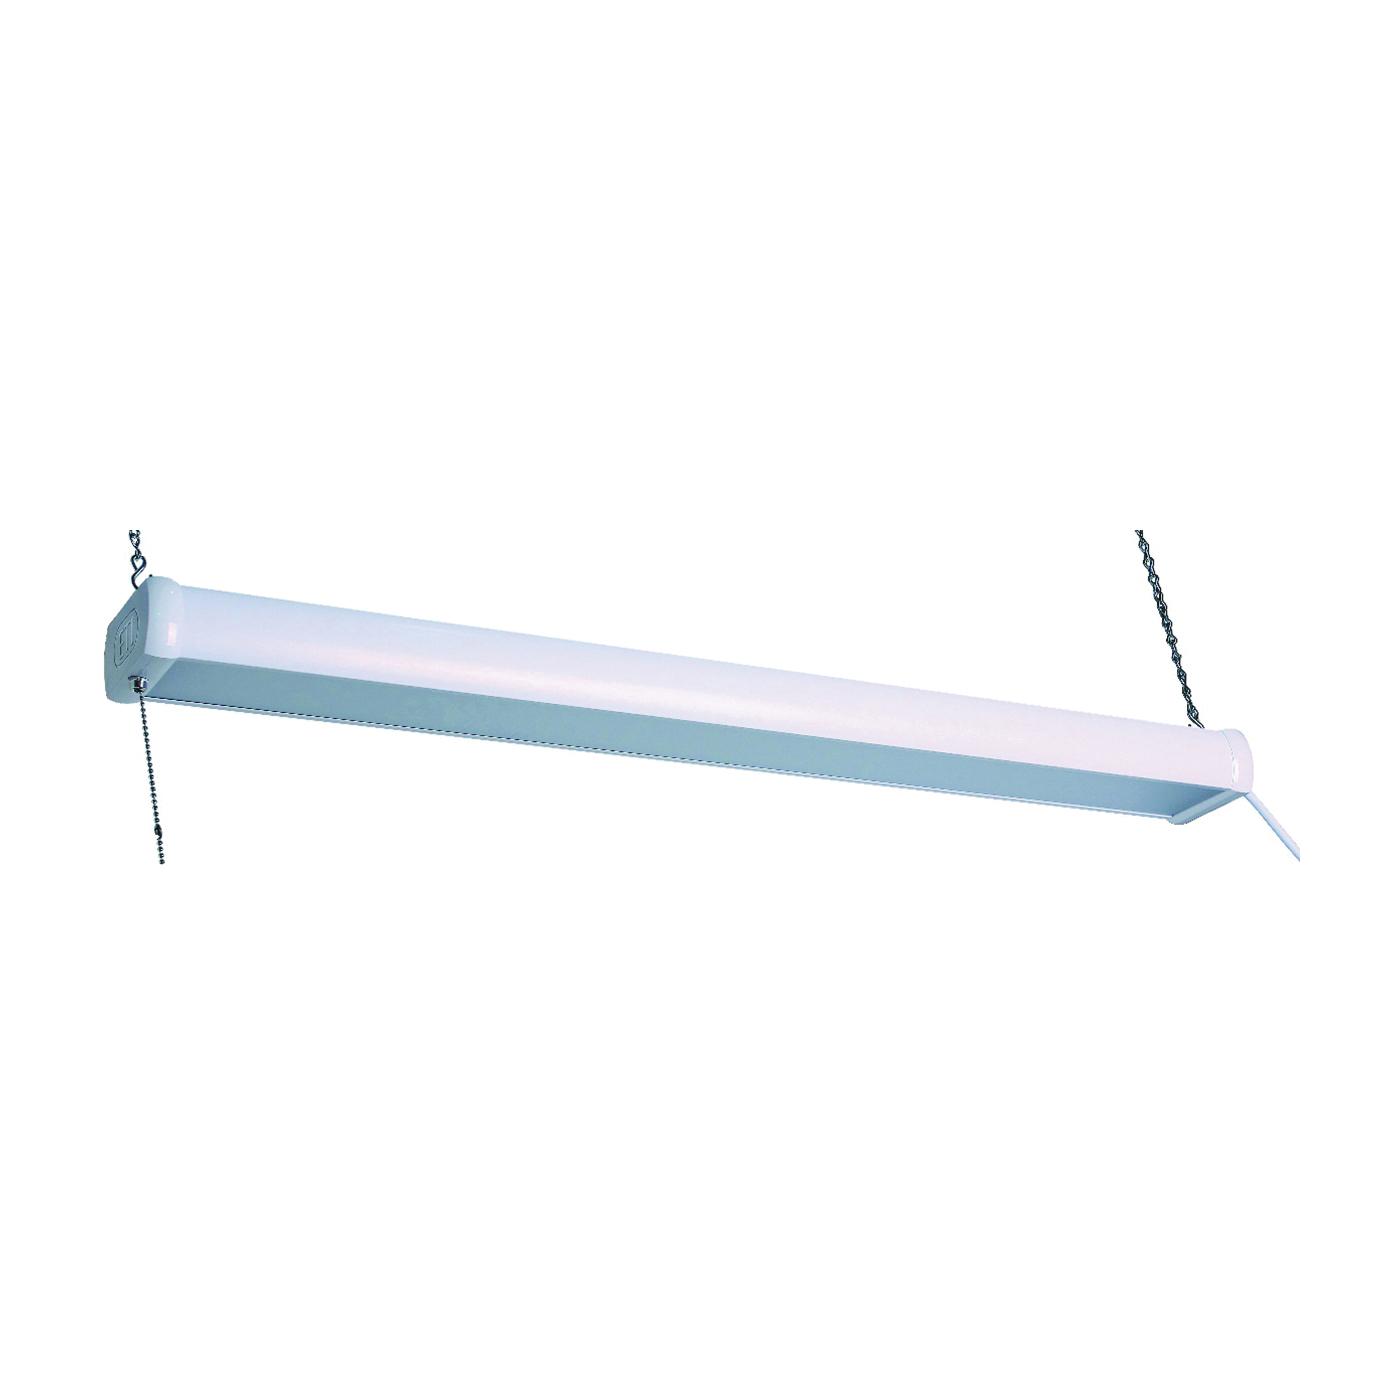 Picture of ETI 54254142 Slim Shop Light, 120 V, 42 W, LED Lamp, 3200 Lumens, 4000 K Color Temp